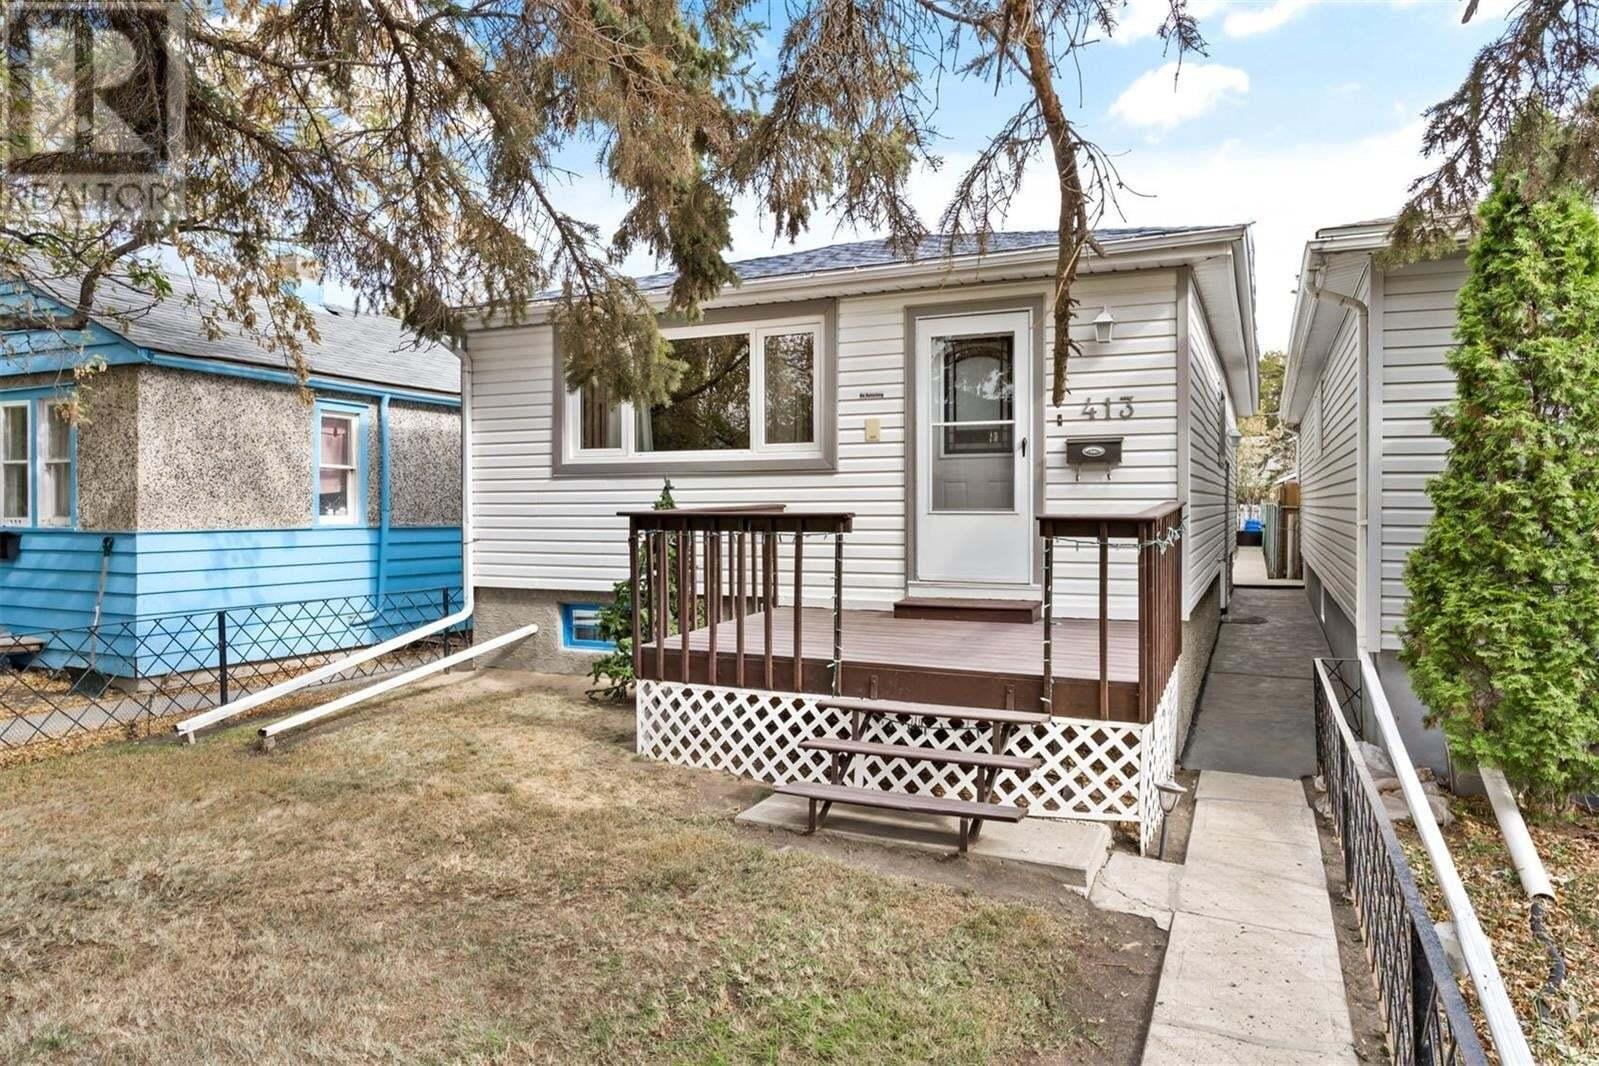 House for sale at 413 St John St Regina Saskatchewan - MLS: SK828455